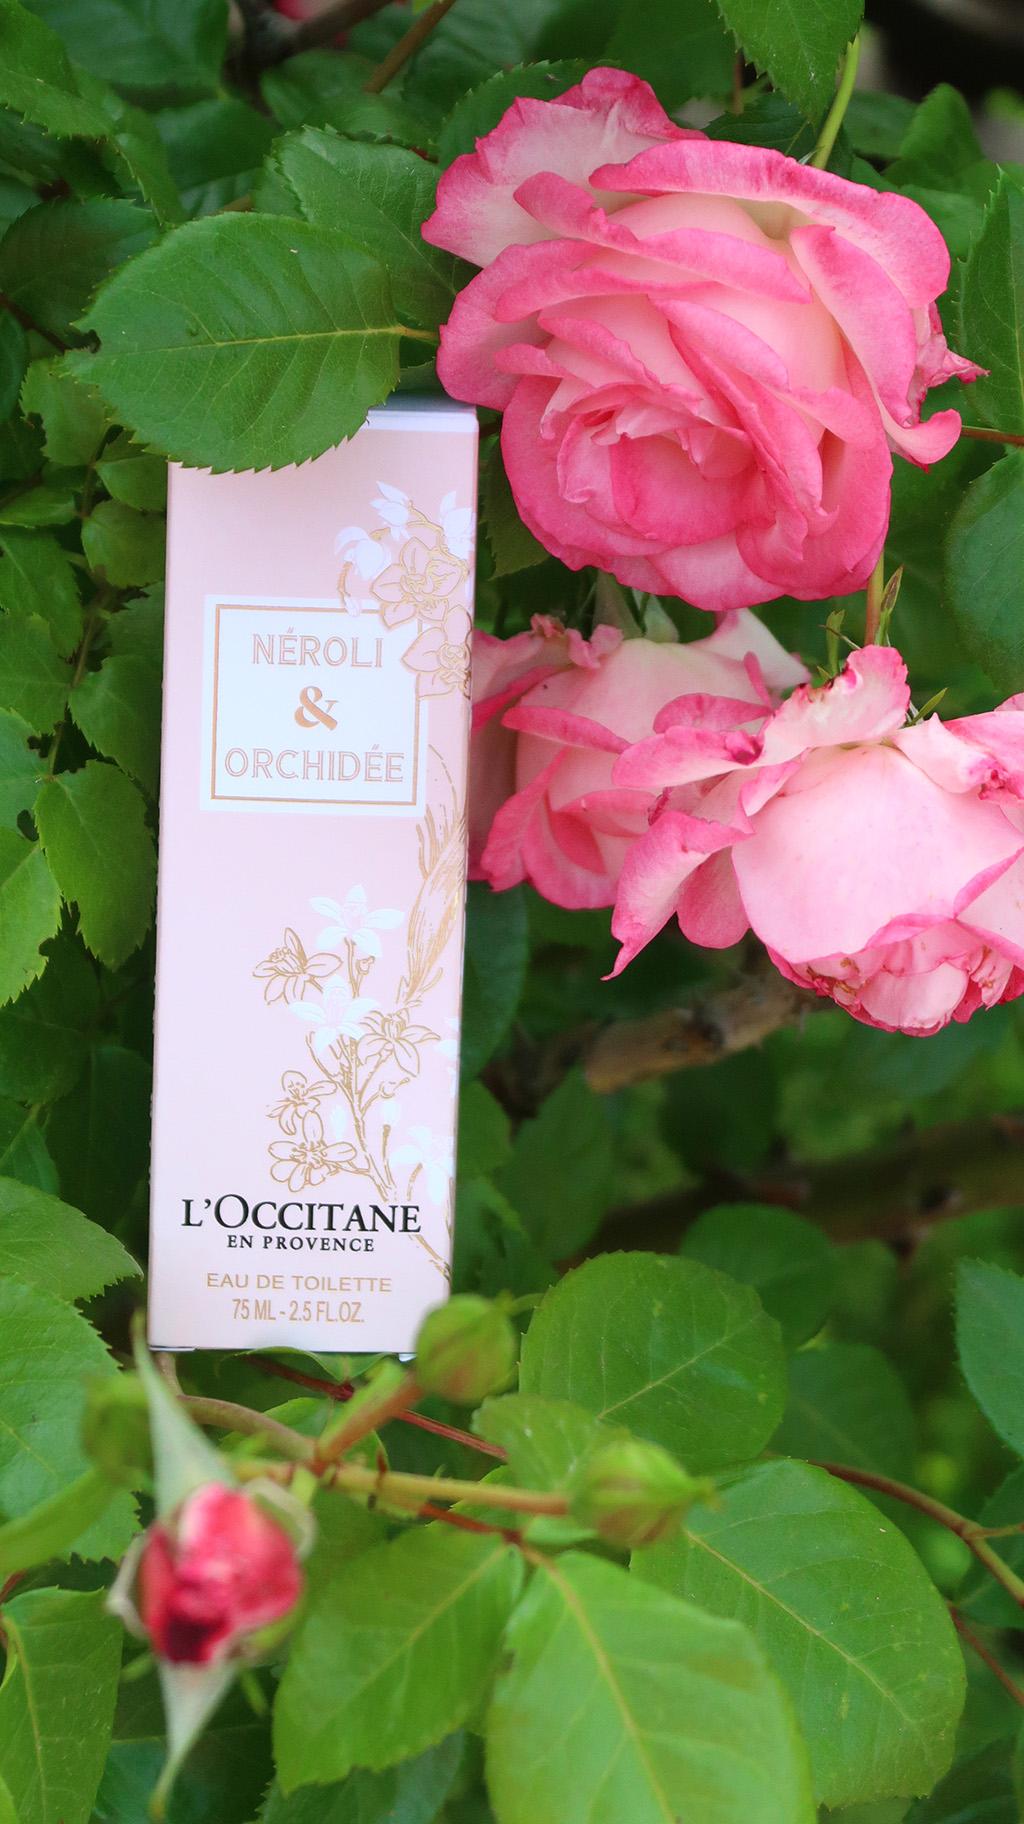 recenzie parfum neroli orchidee l'occitane review perfume